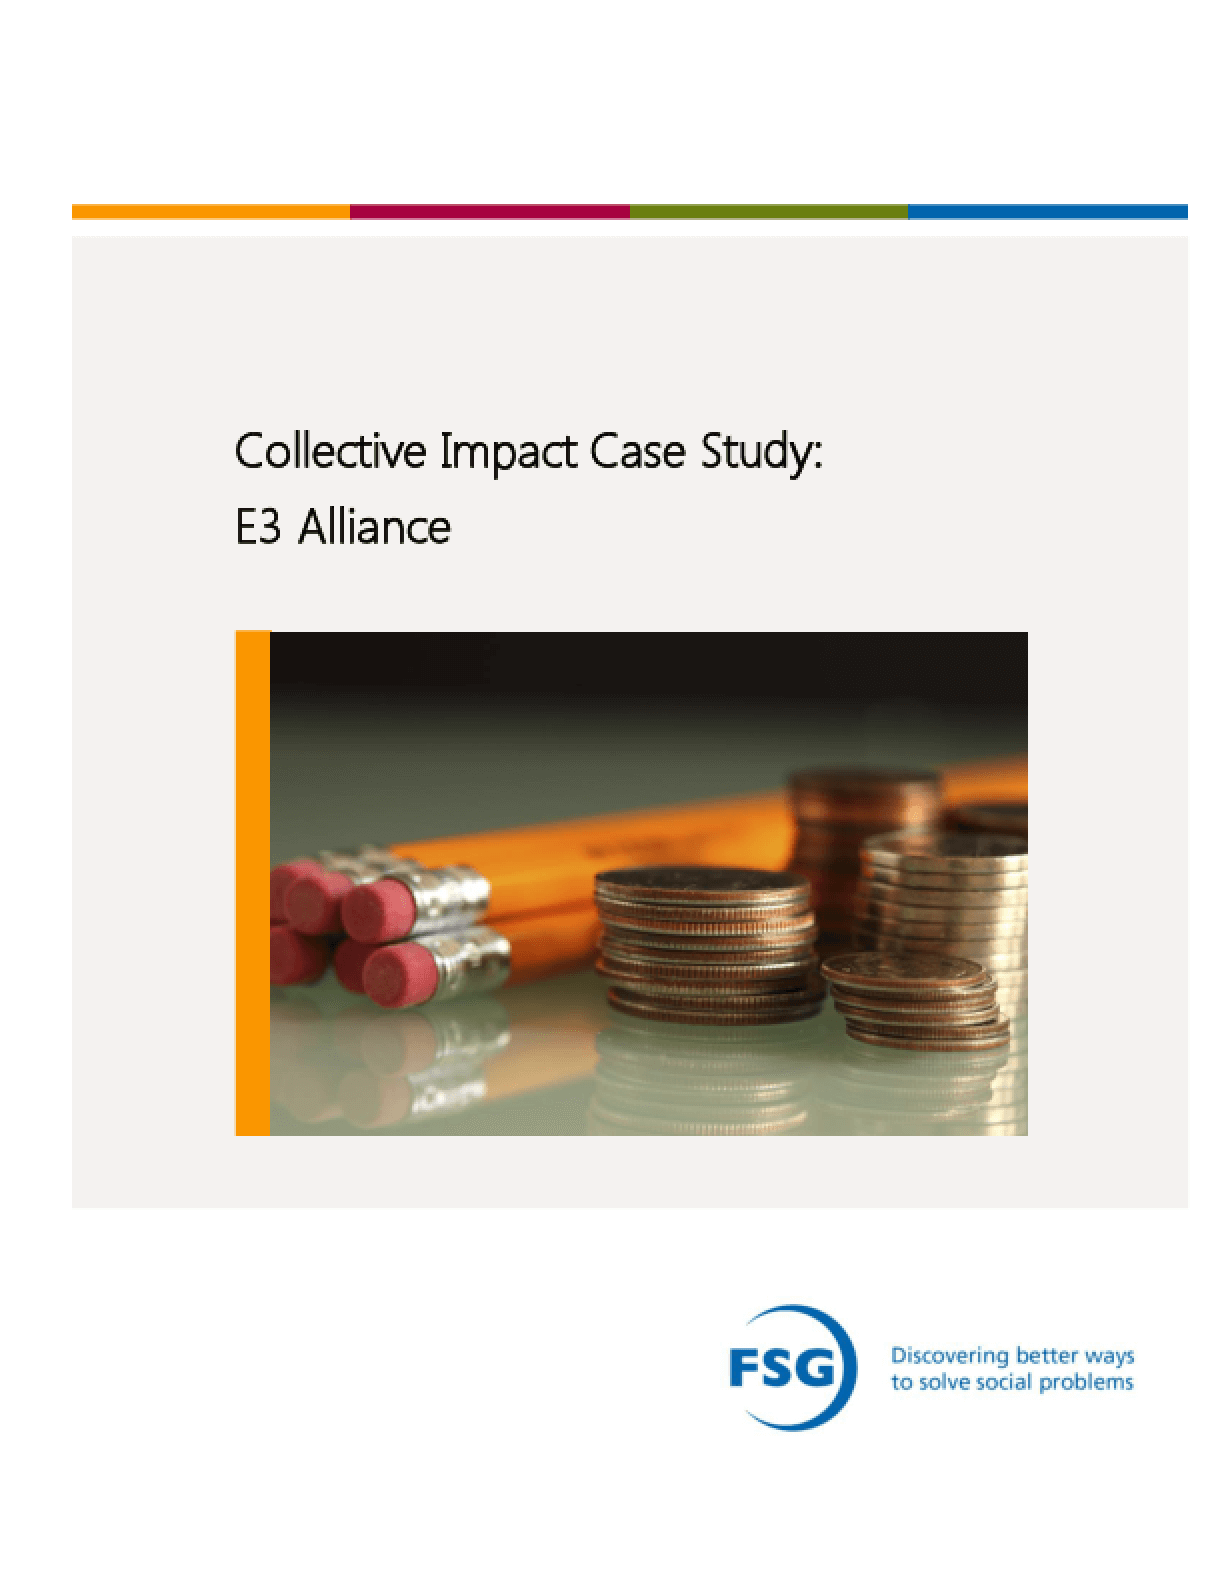 Collective Impact Case Study: E3 Alliance